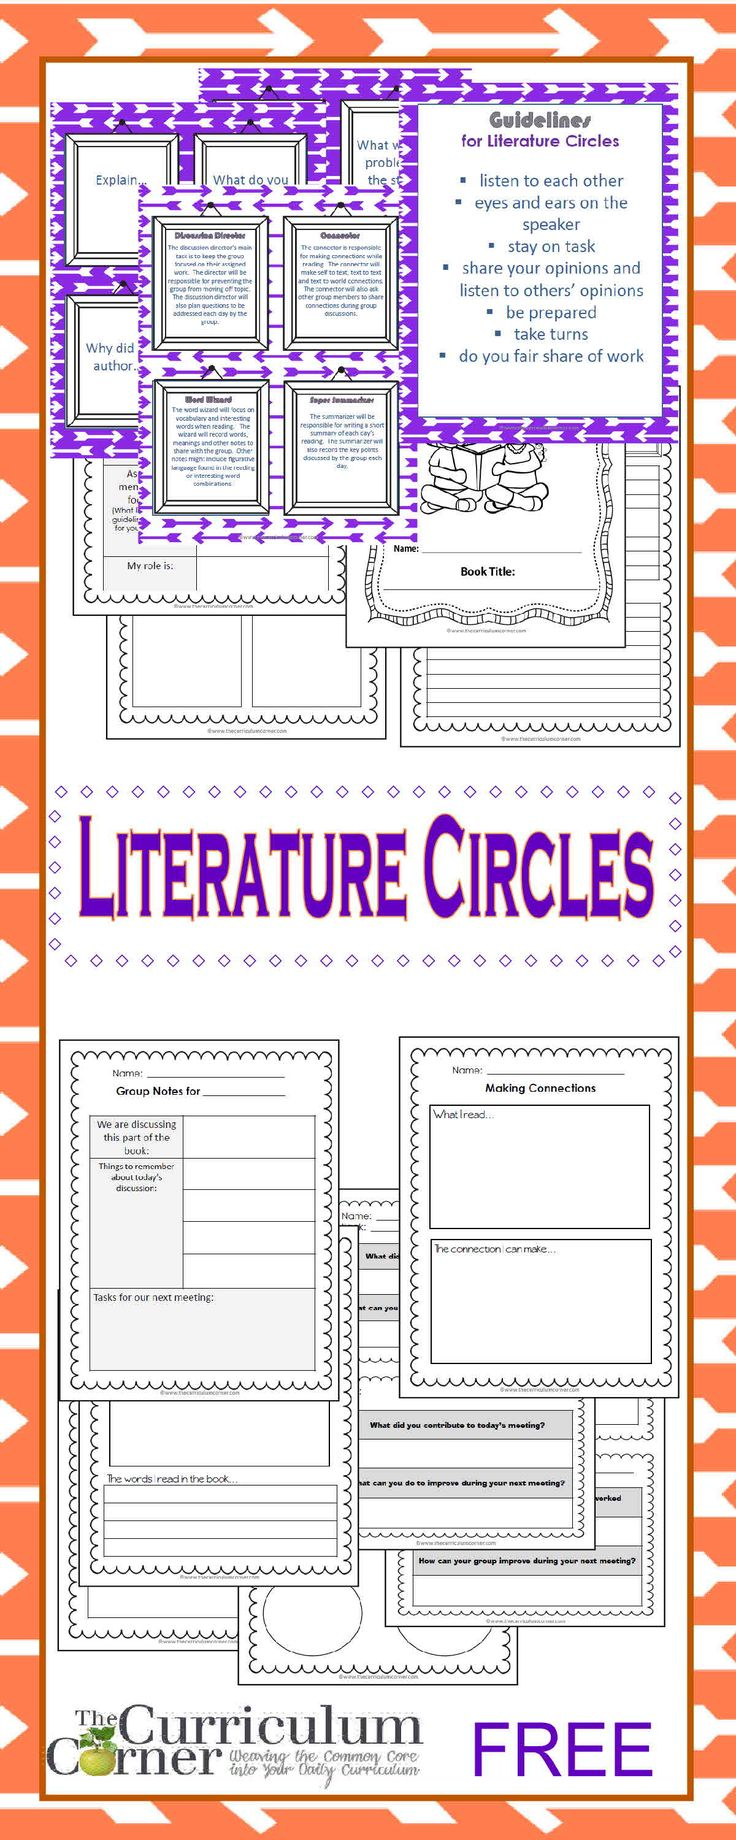 Workbooks literature circles roles worksheets : 24 best Literature Circle Blogs images on Pinterest | Teaching ...